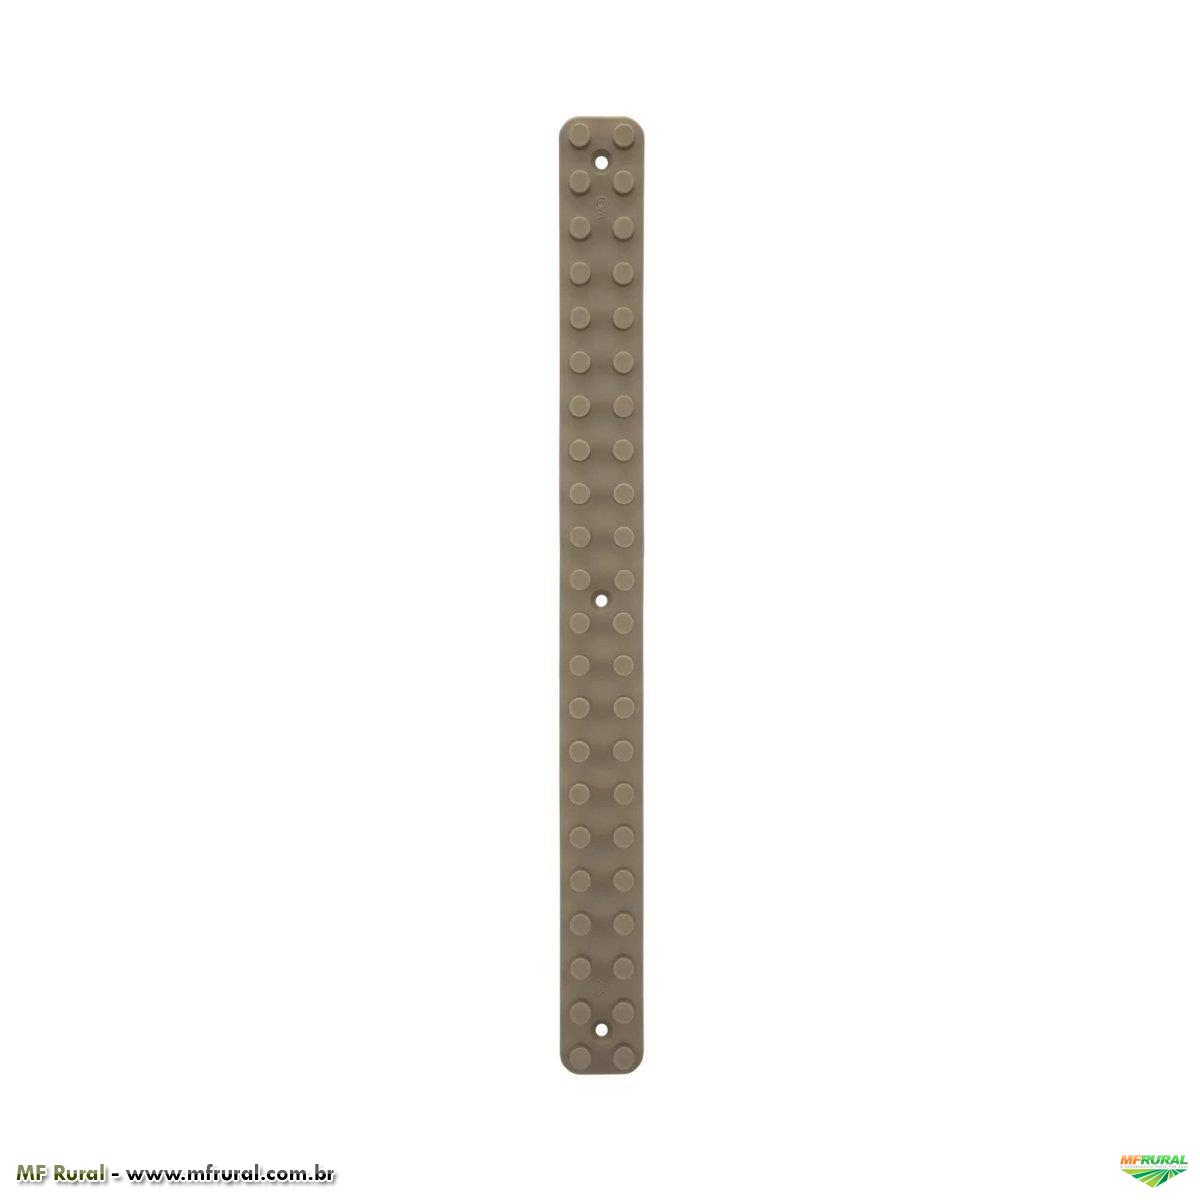 Barra Grande Organizador Loft Up Coza 44 x 4 x 2,5 cm Concreto